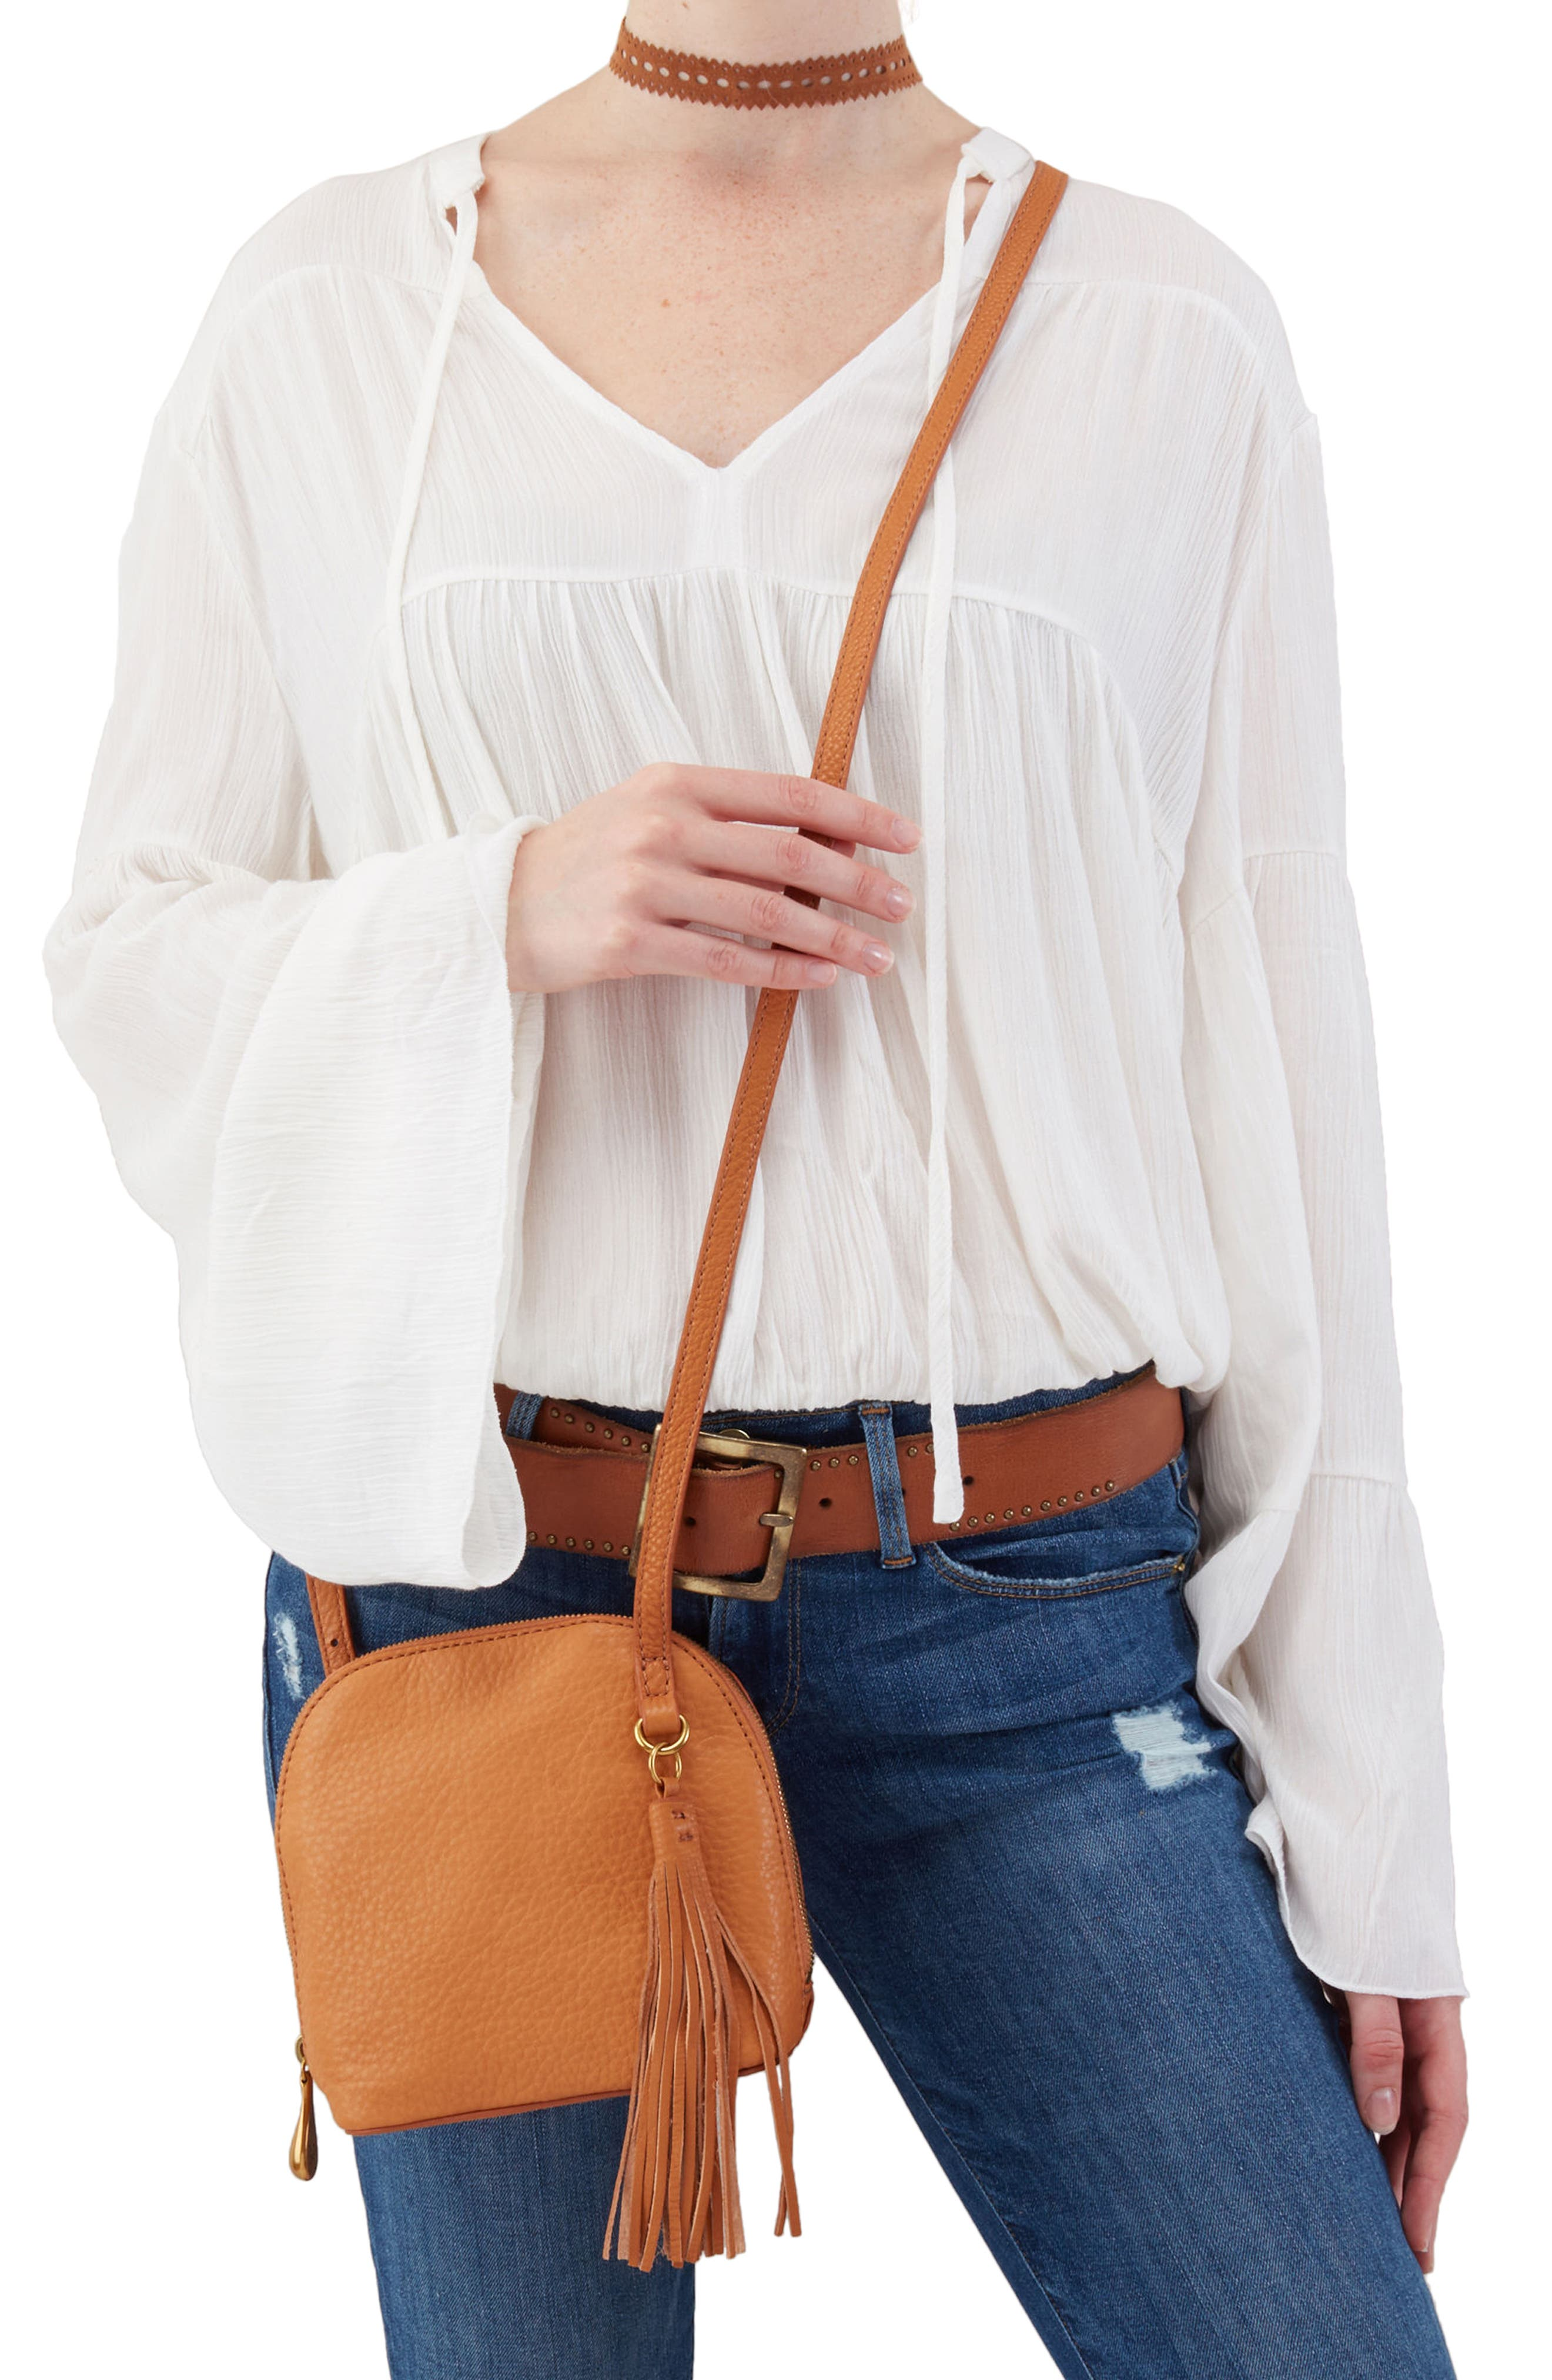 Nash Calfskin Leather Crossbody Bag,                             Alternate thumbnail 2, color,                             WHISKEY